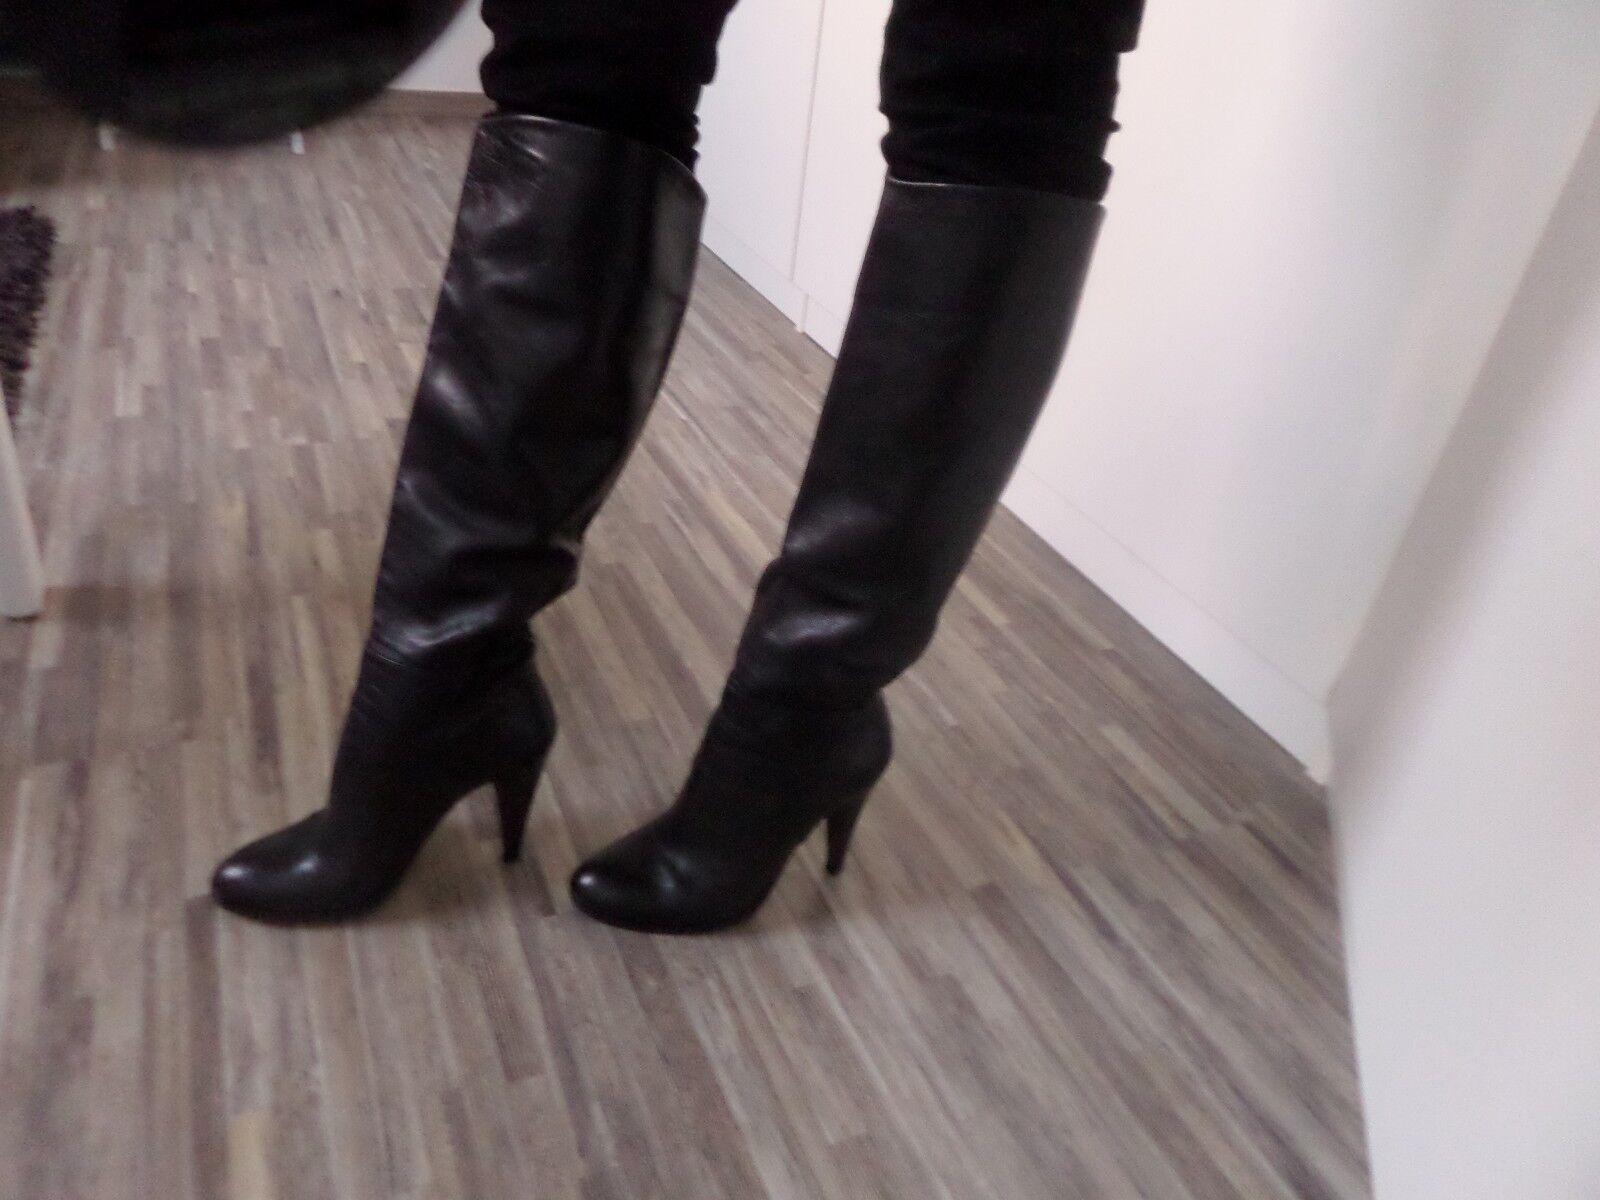 Bottes cuir noir René Lezard 38.5 high heels 329EUR schwarz Leder Stiefel 5 329EUR heels 1b3531